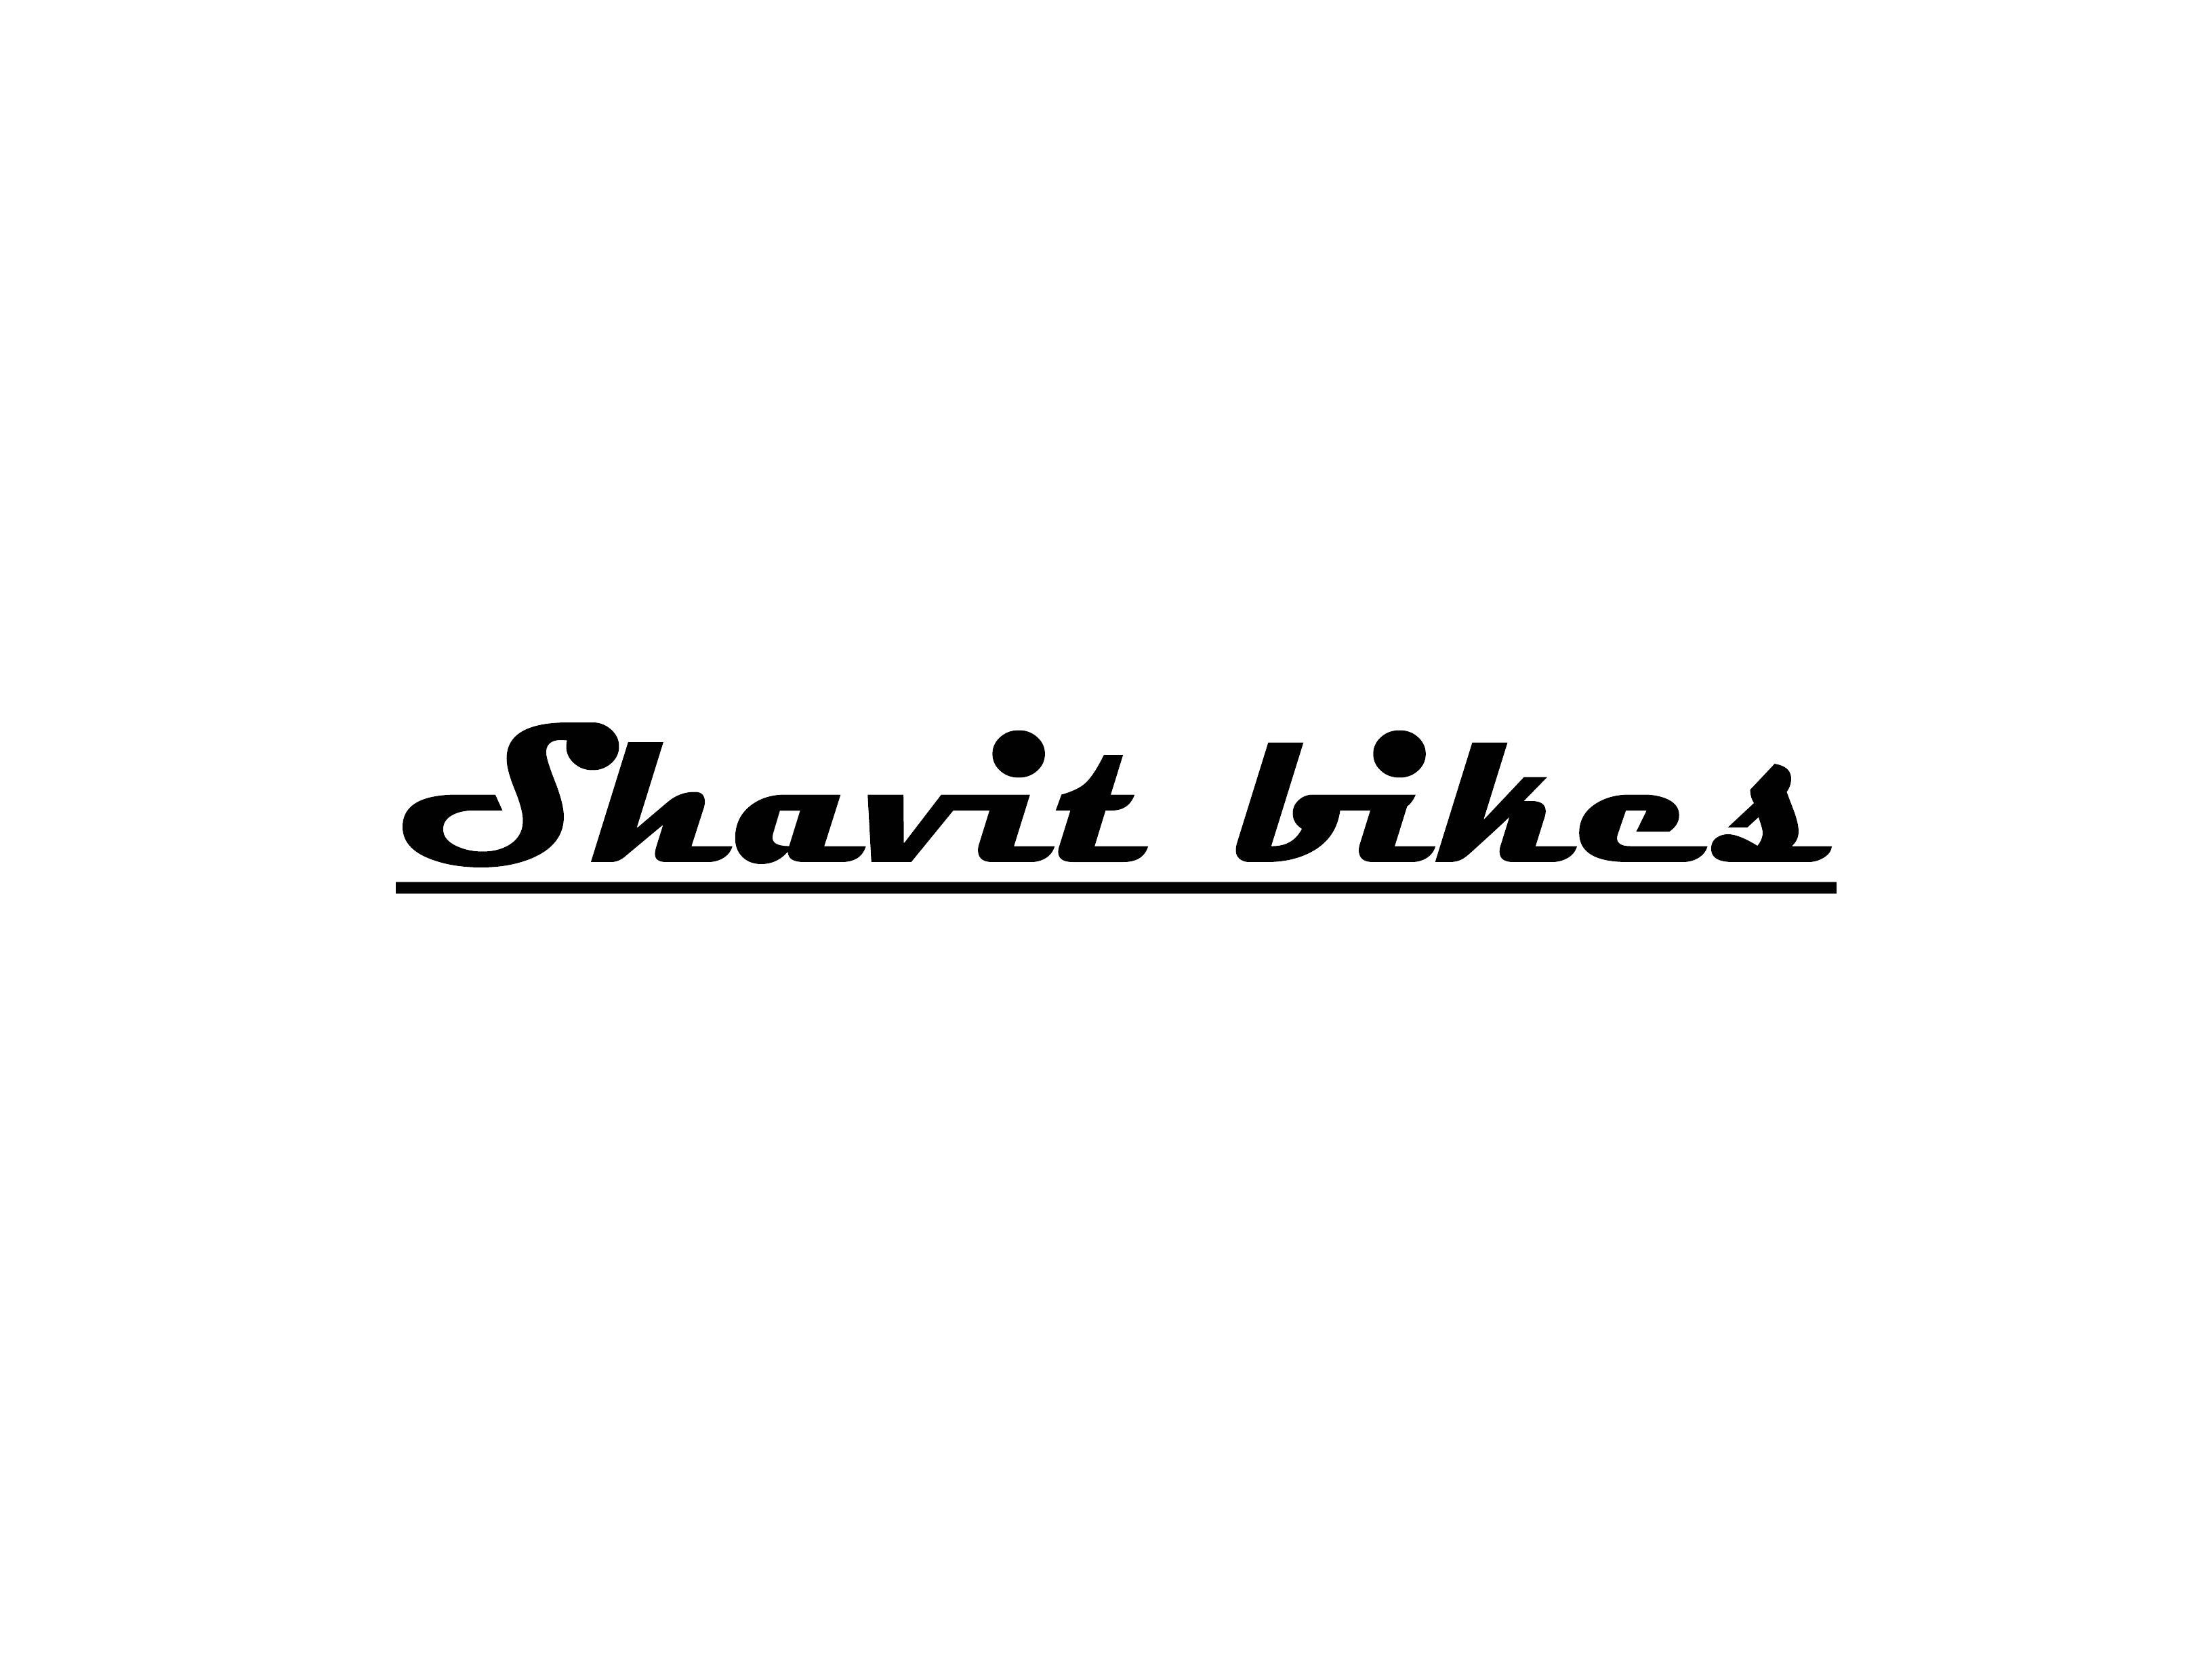 SHAVIT BIKES